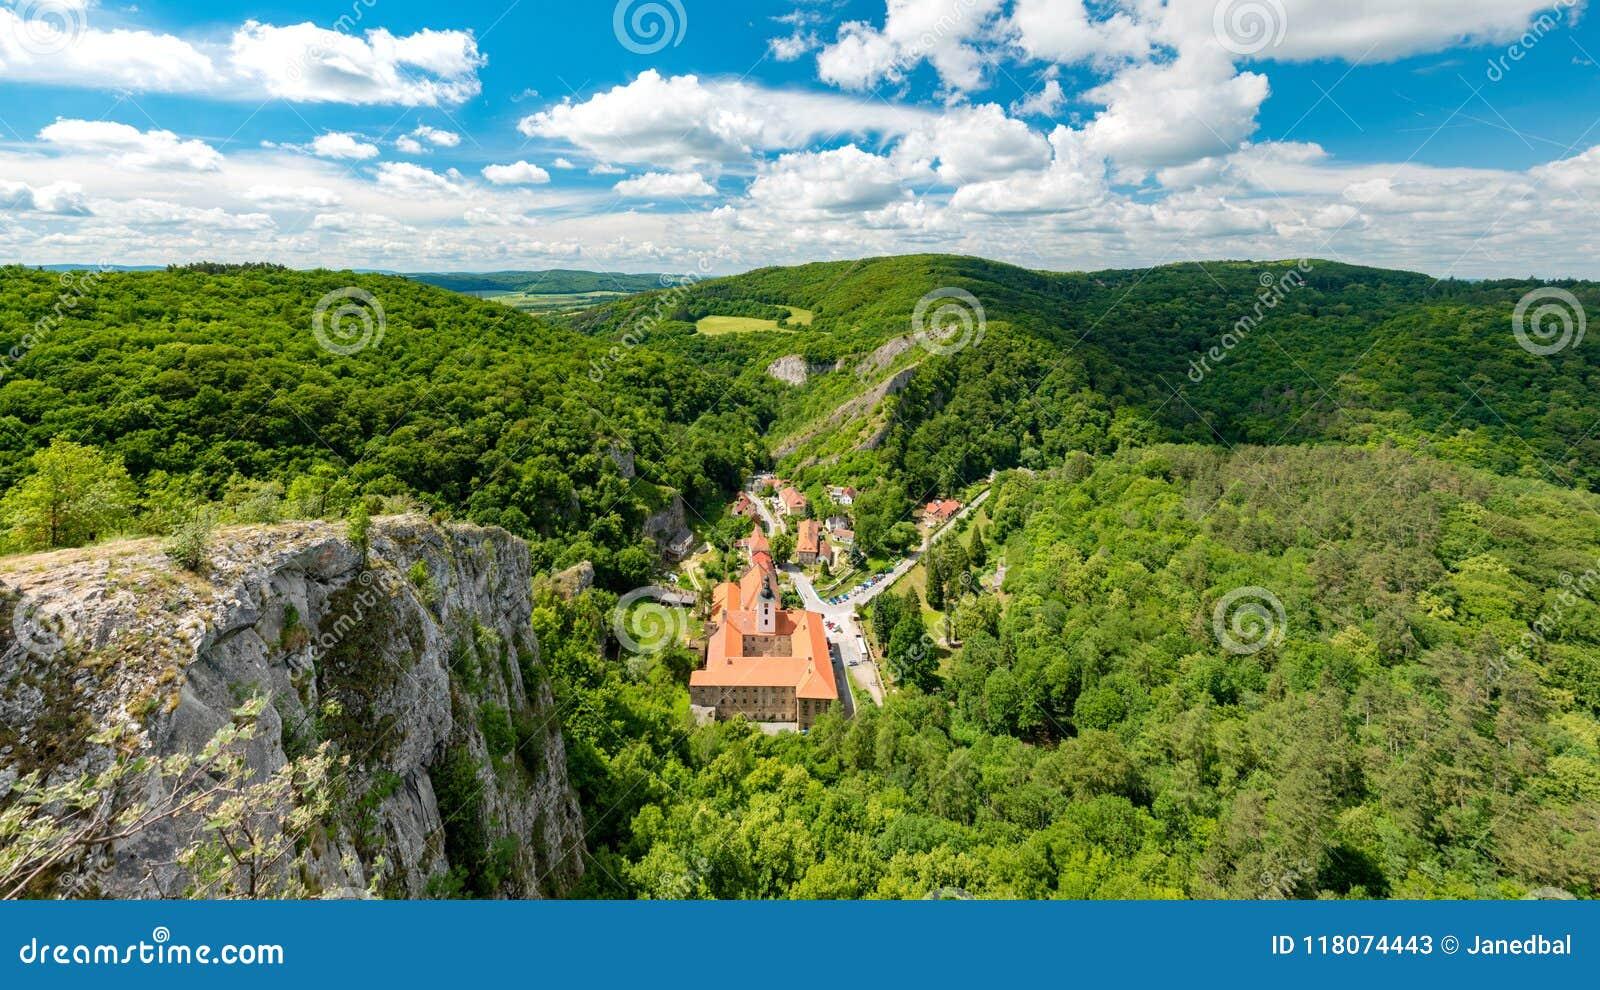 Svaty Jan pod Skalou monastery, Beroun District, Central Bohemian Region, Czech Republic